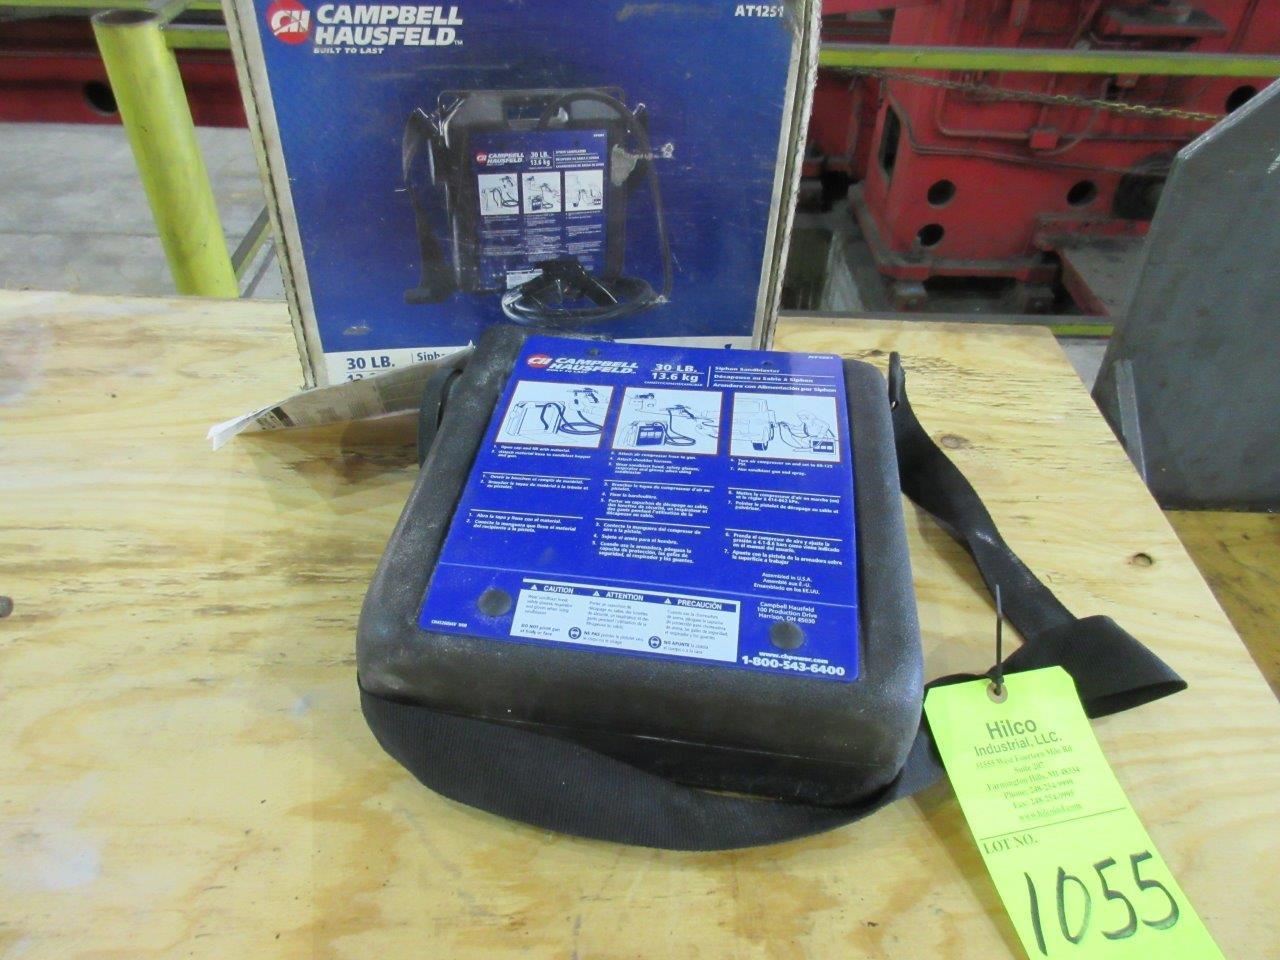 Campbell Hausfeld Model AT1251 Portable Siphon Sand Blaster